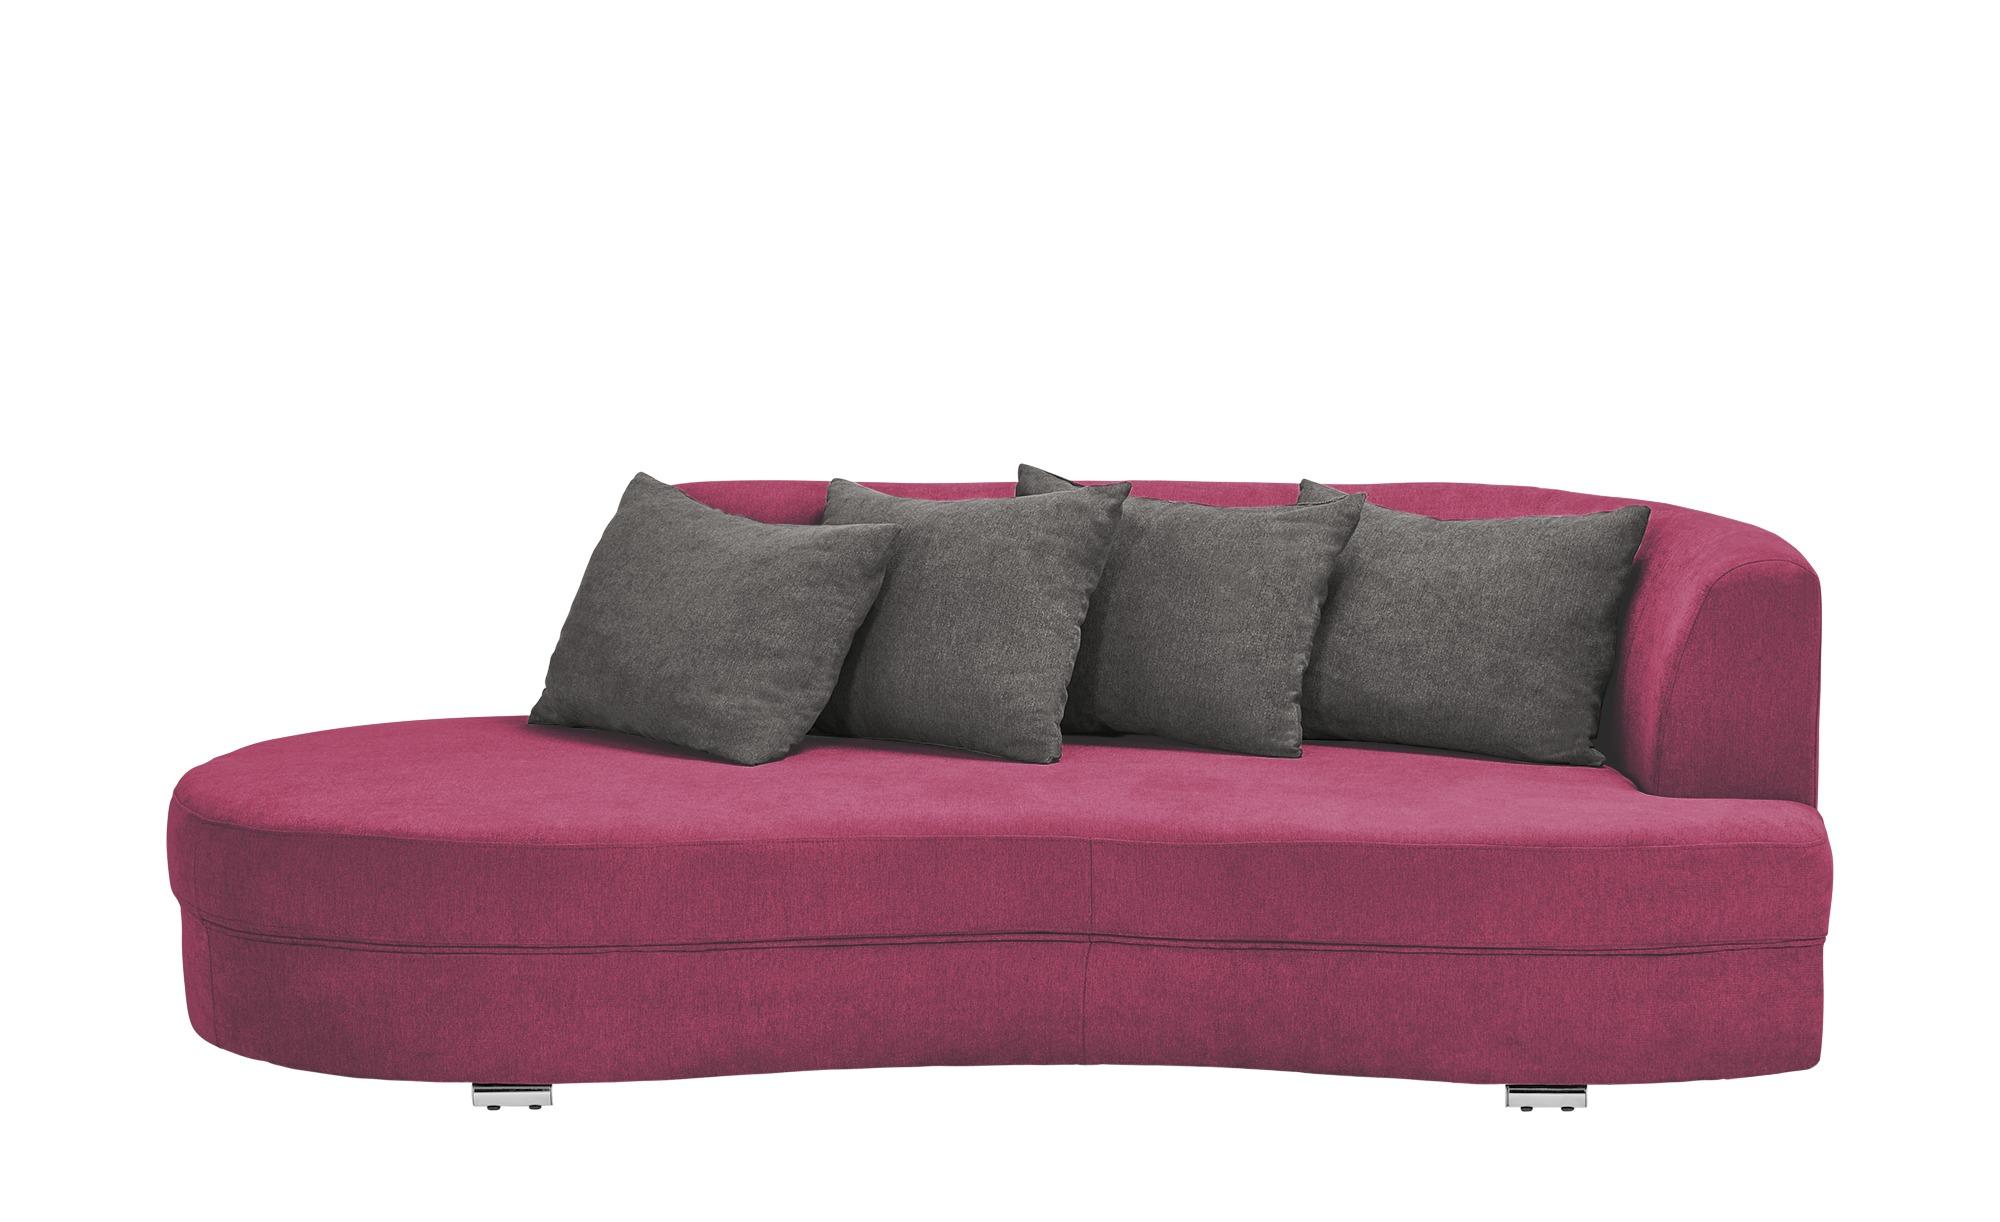 smart Big Sofa rot - Flachgewebe Marina ¦ rot ¦ Maße (cm): B: 211 H: 69 T: 109 Polstermöbel > Sofas > Big-Sofas - Höffner